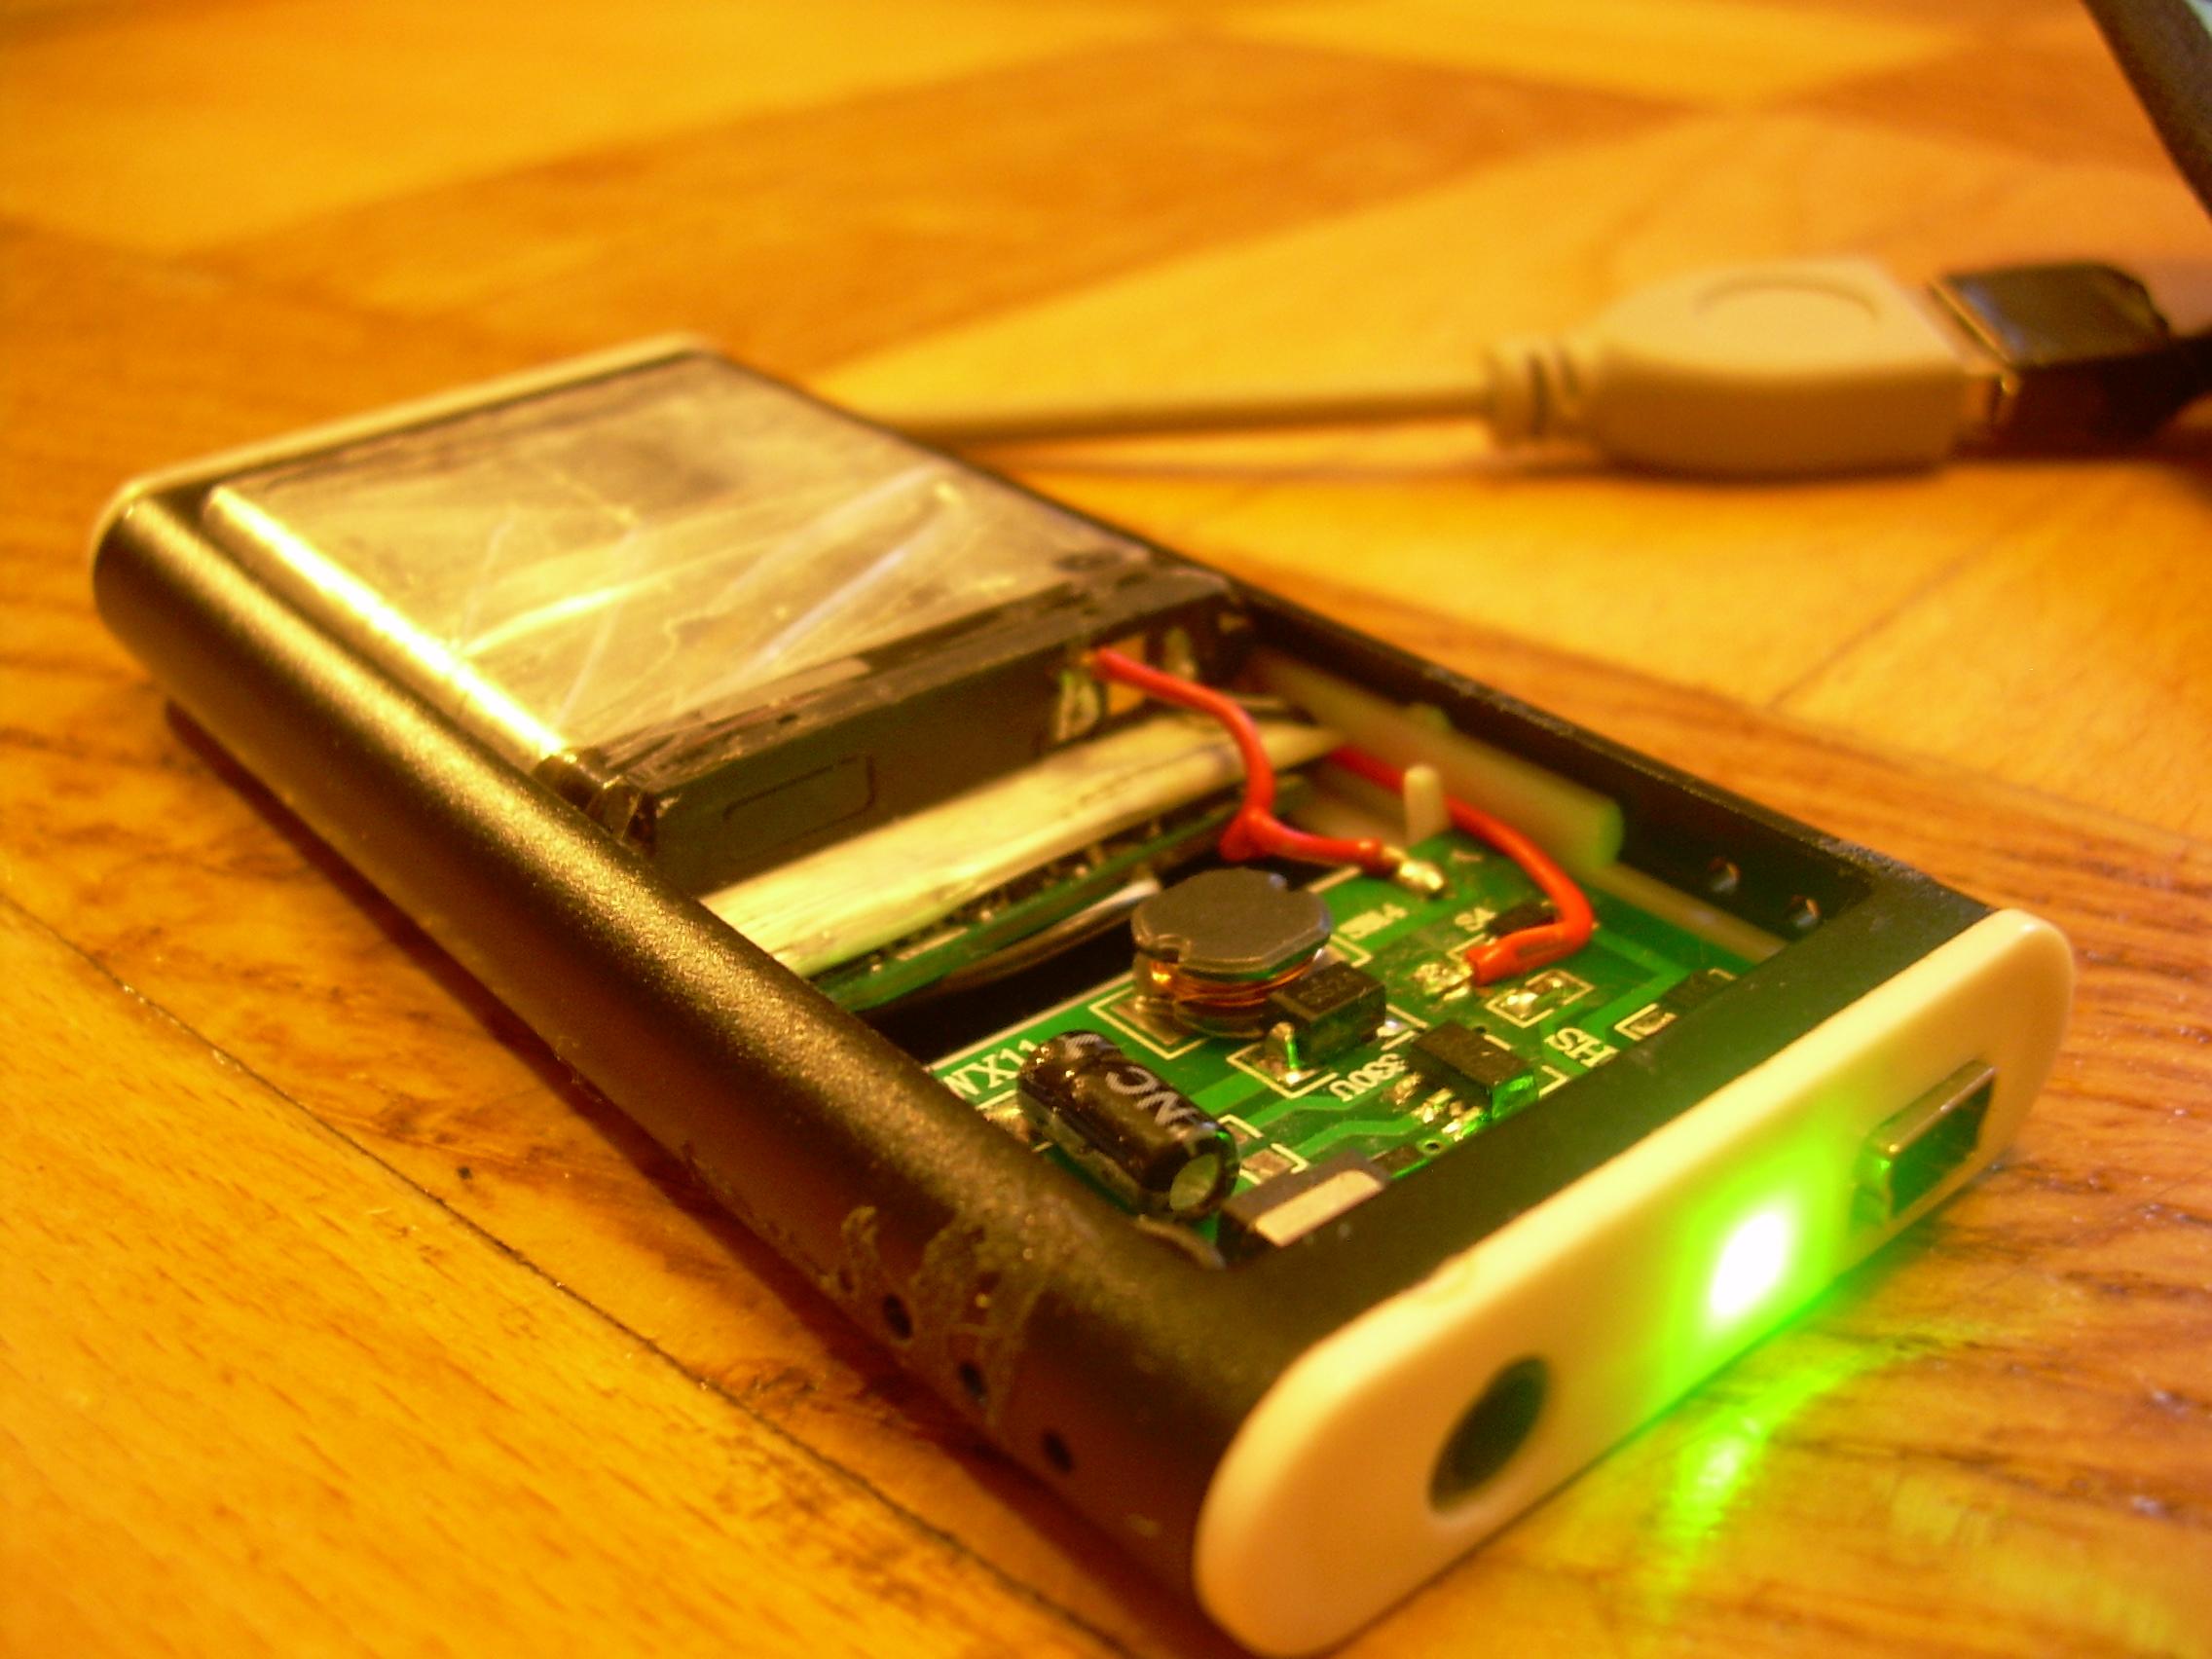 Usb аккумулятор для телефона своими руками из аккумулятора